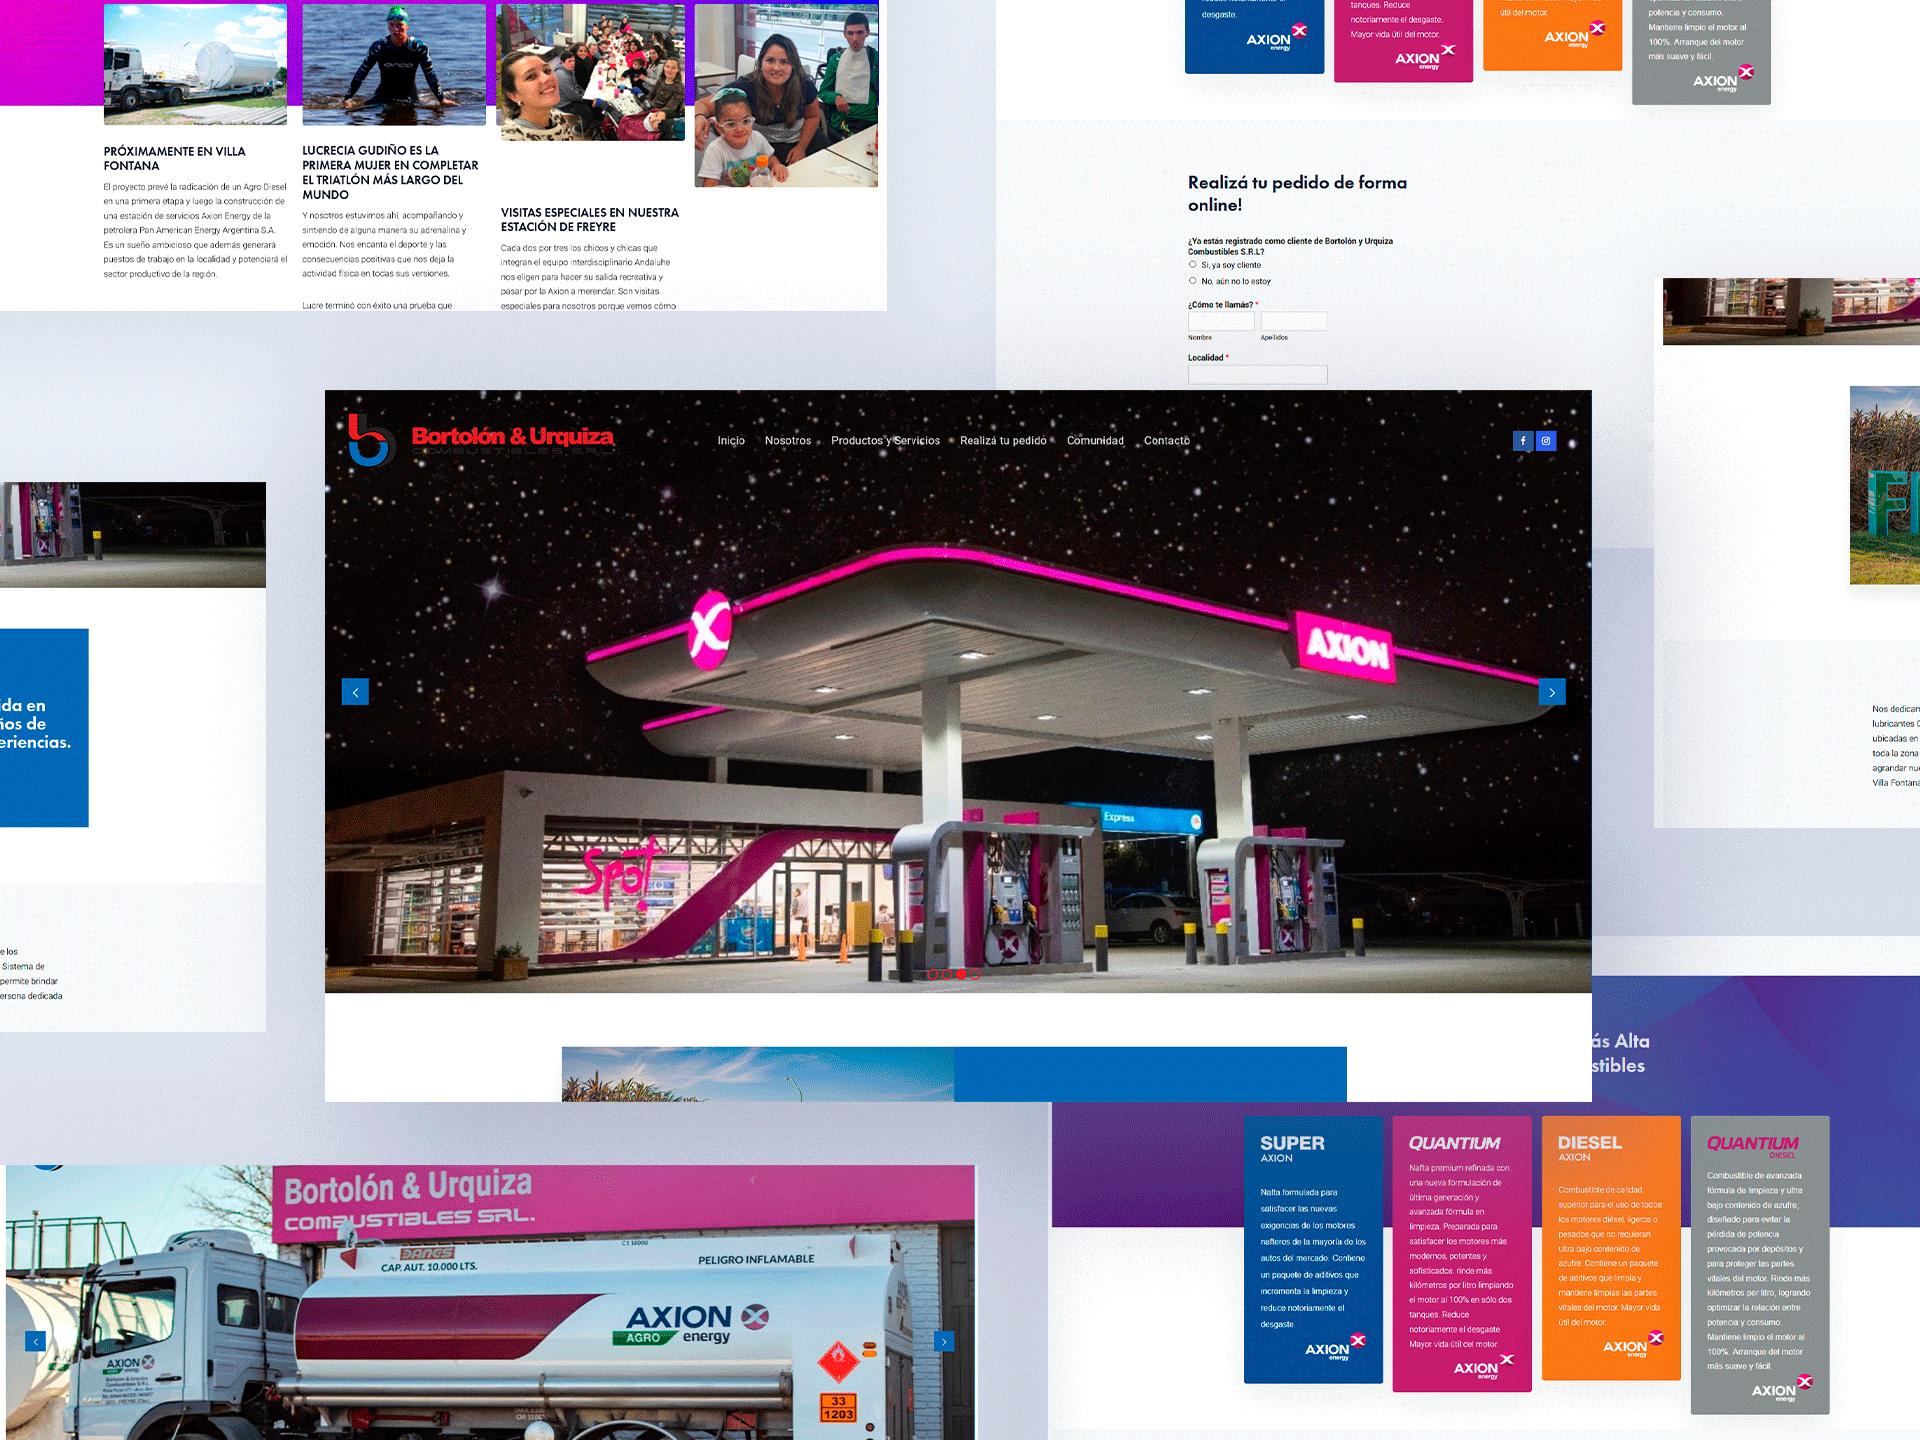 Bortolón & Urquiza – Combustibles